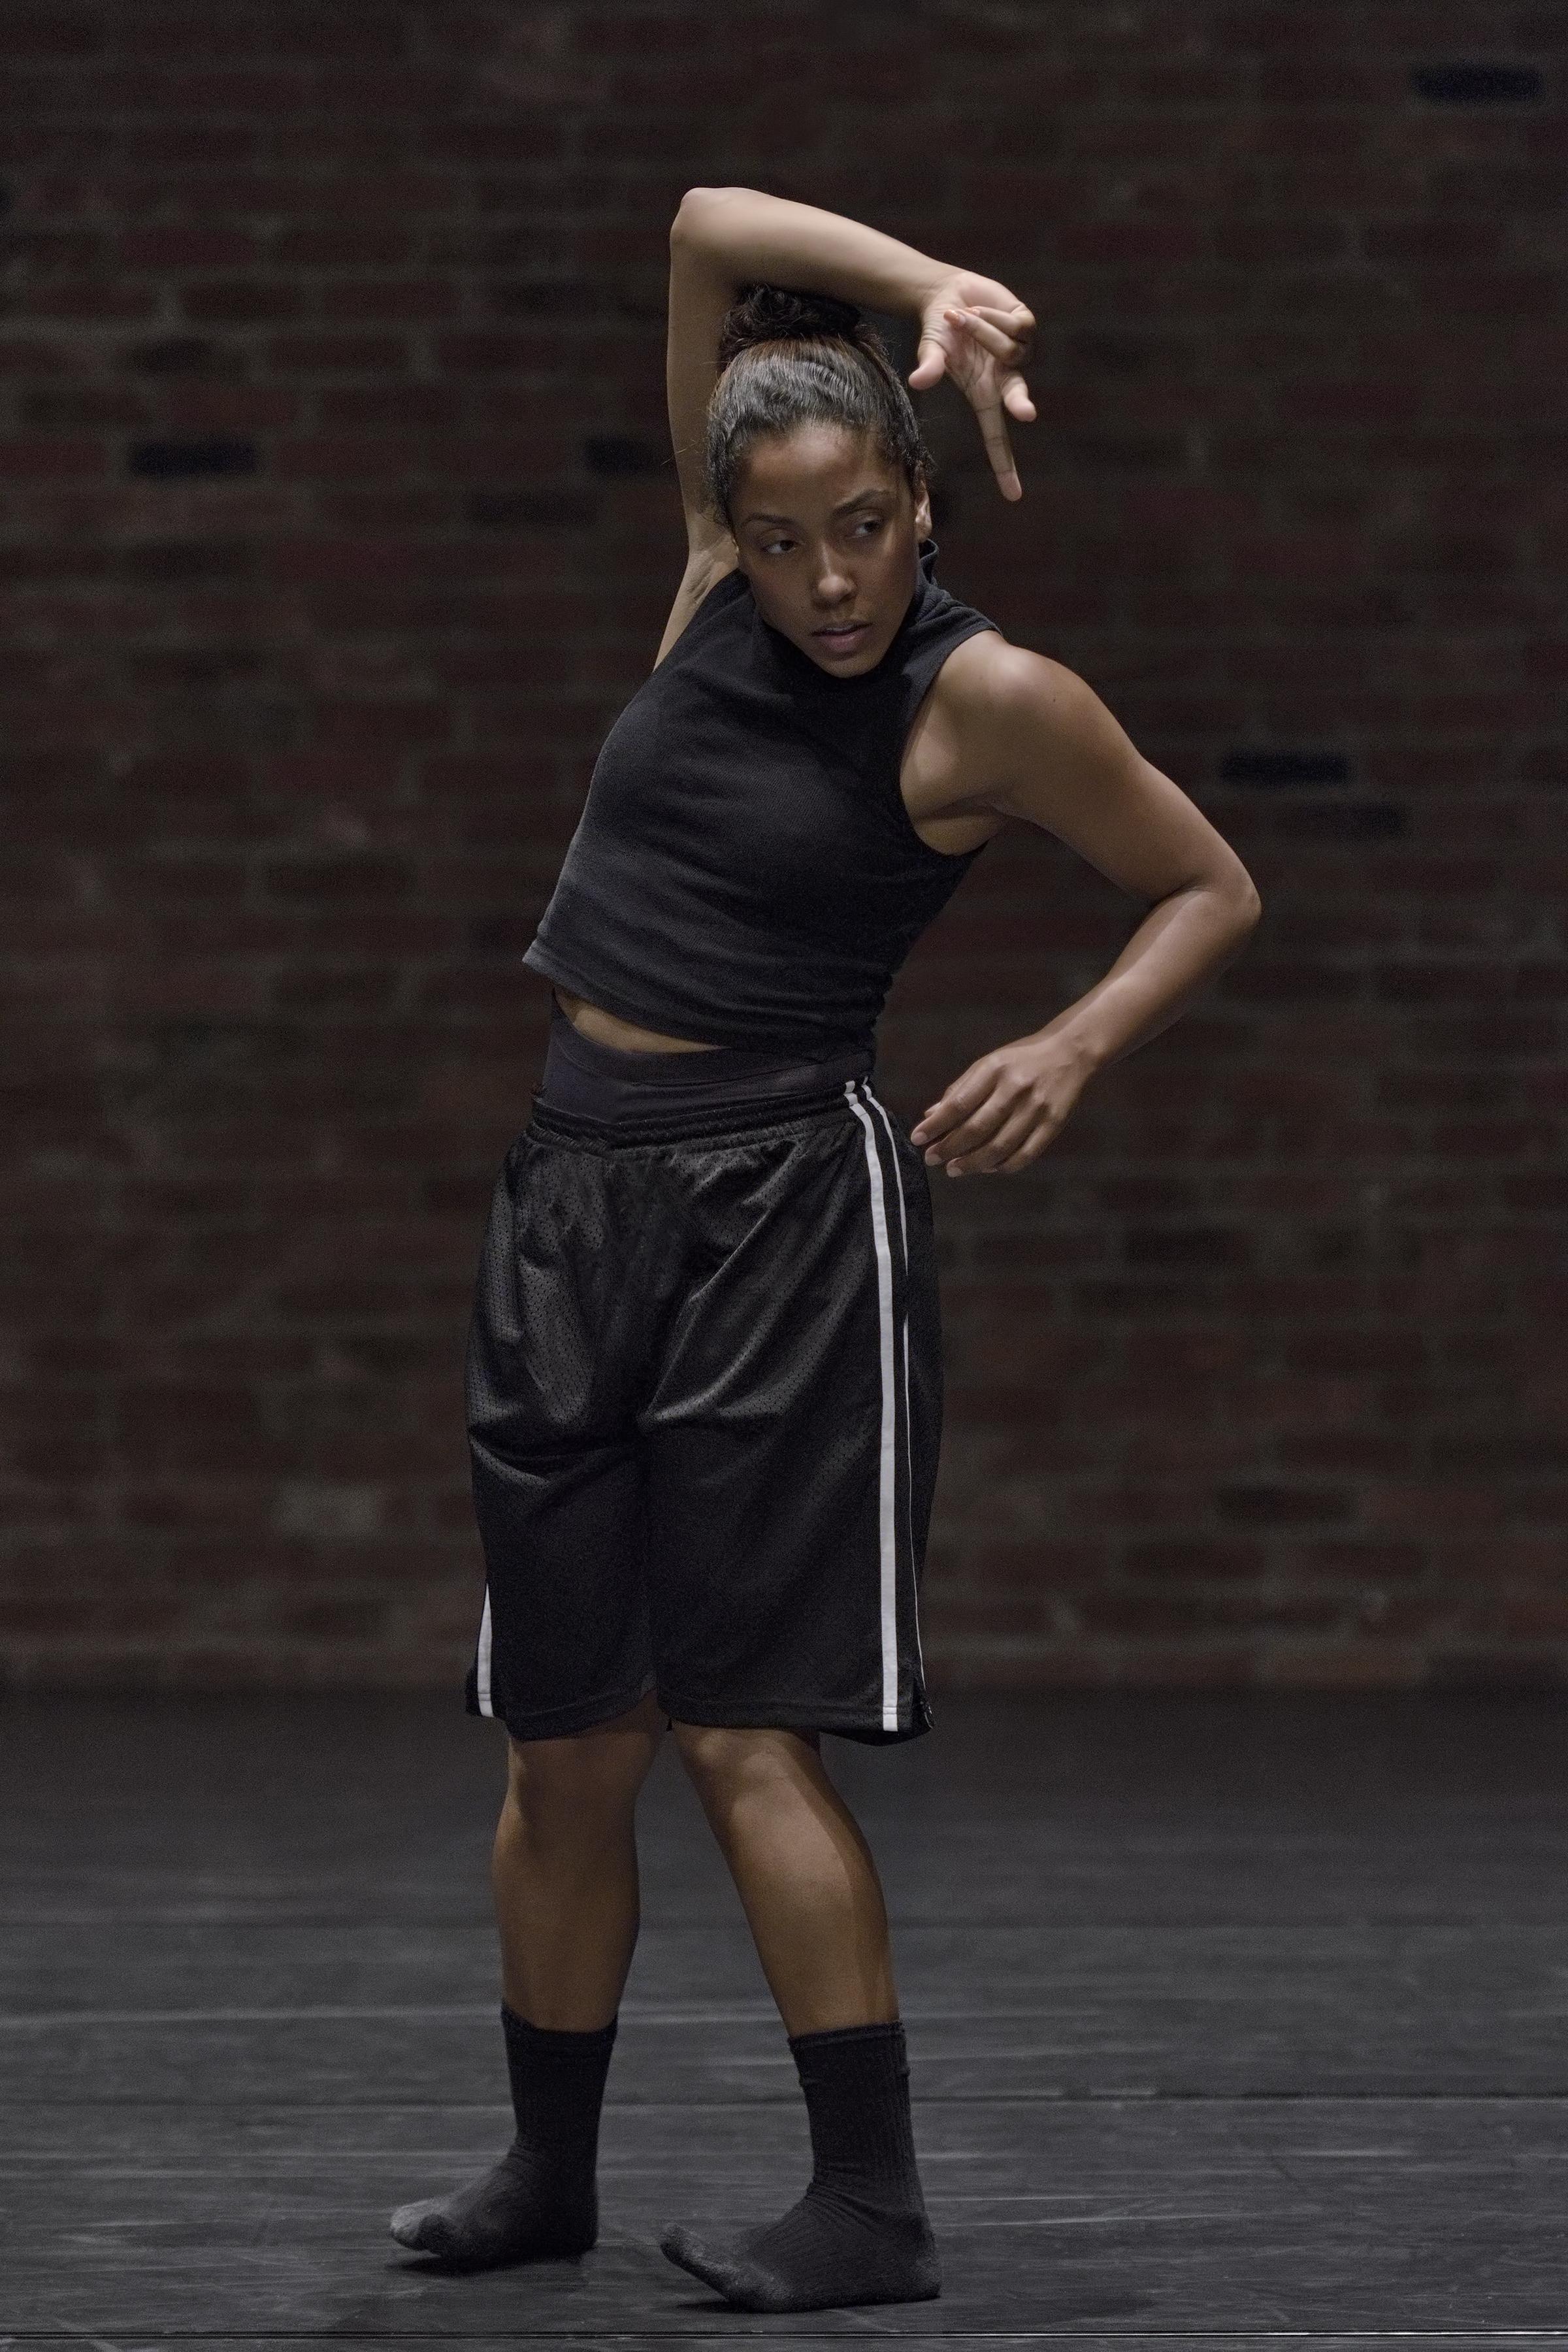 Photography by Michael Slobodian of dancer Livona Ellis for 'big kid'